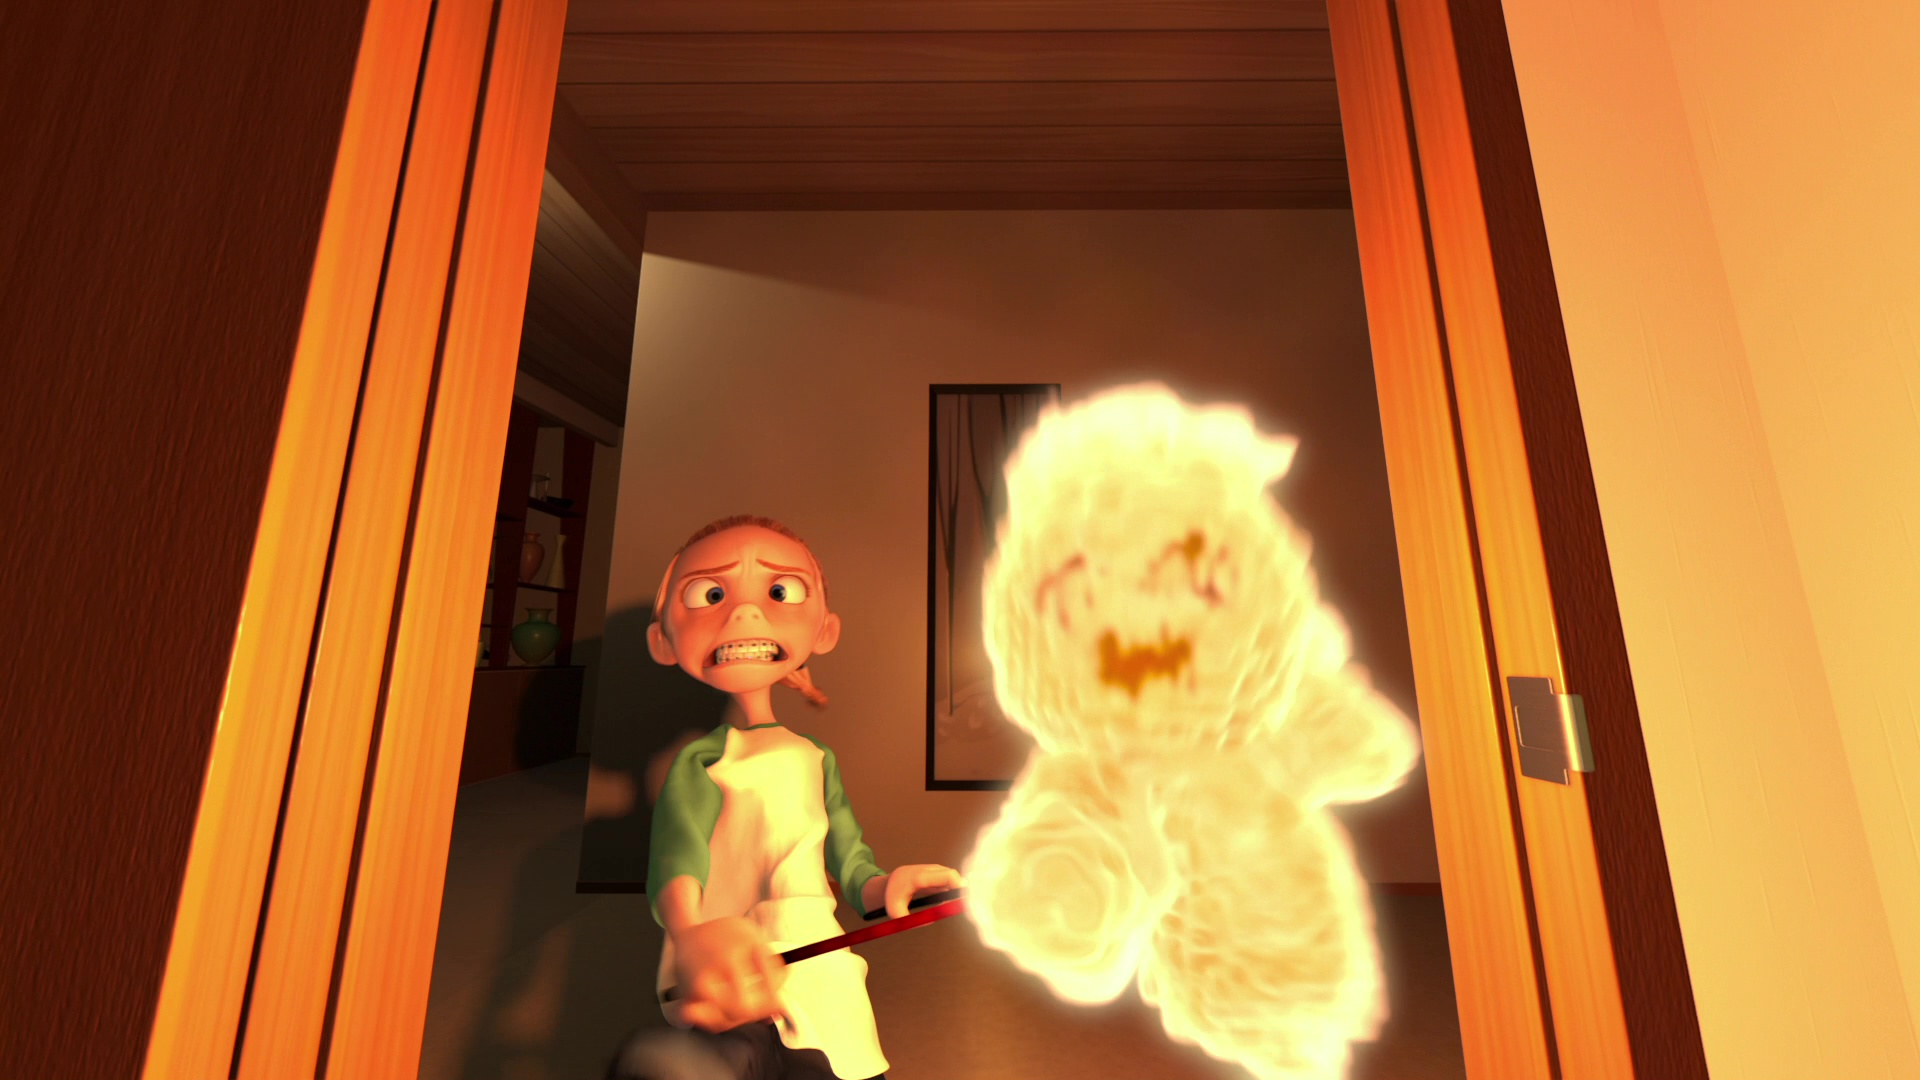 pixar disney baby-sitting jack-jack attack